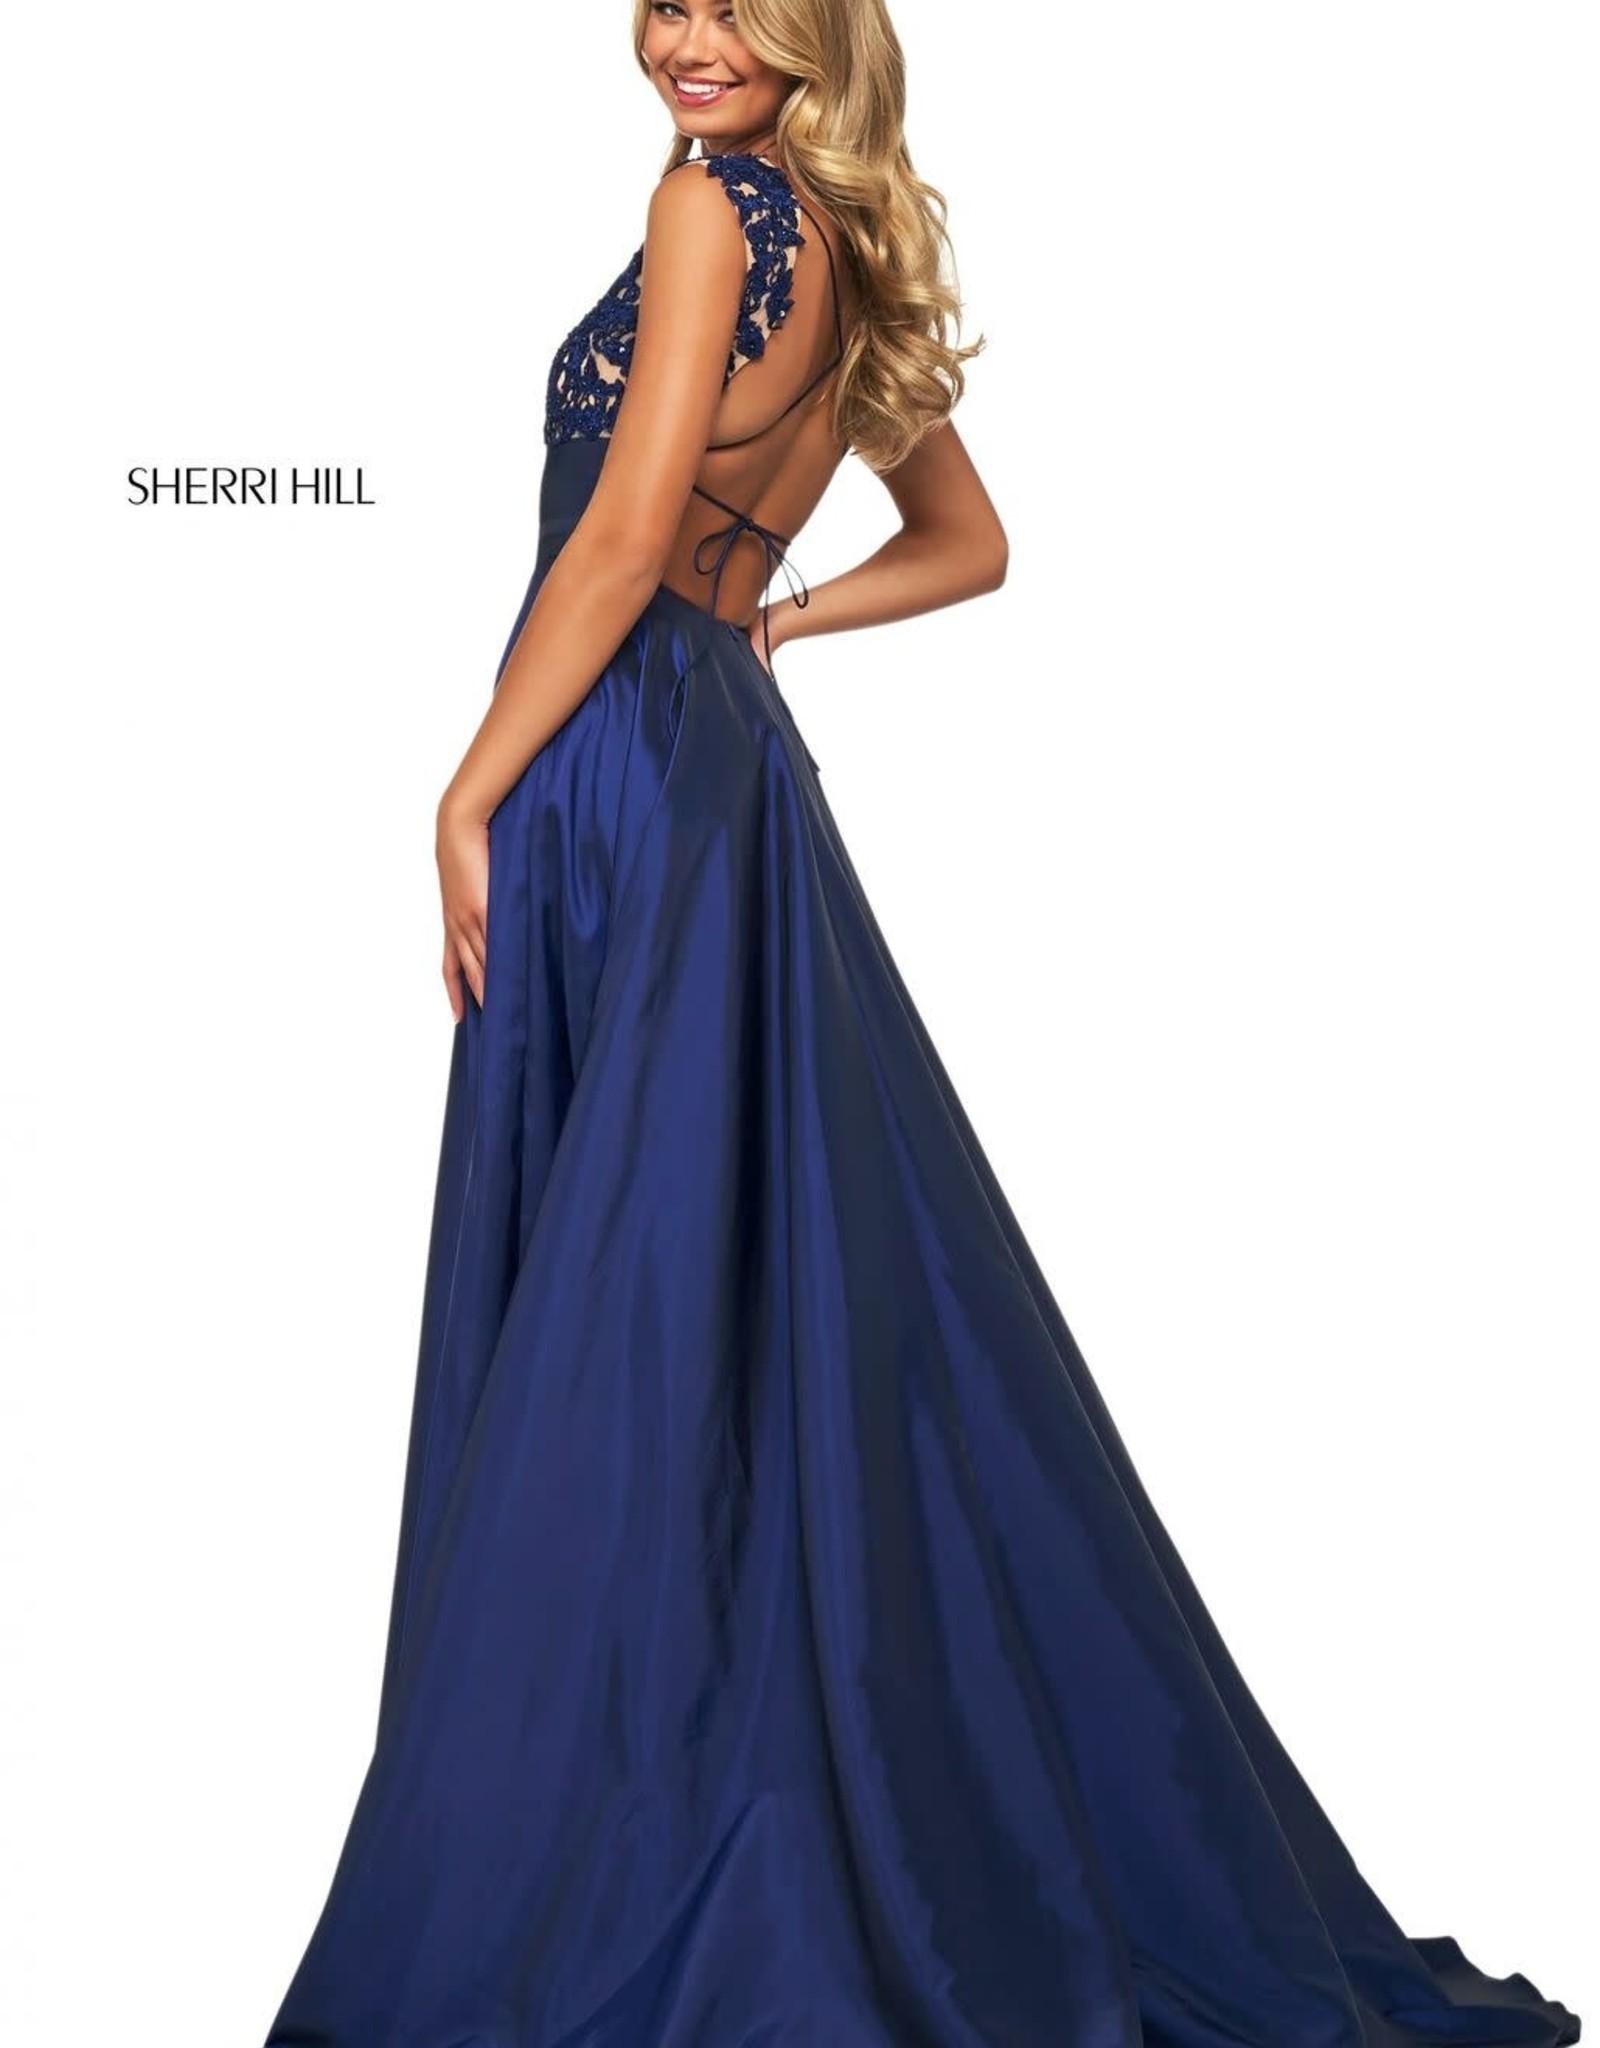 Sherri Hill Sherri Hill Navy 0